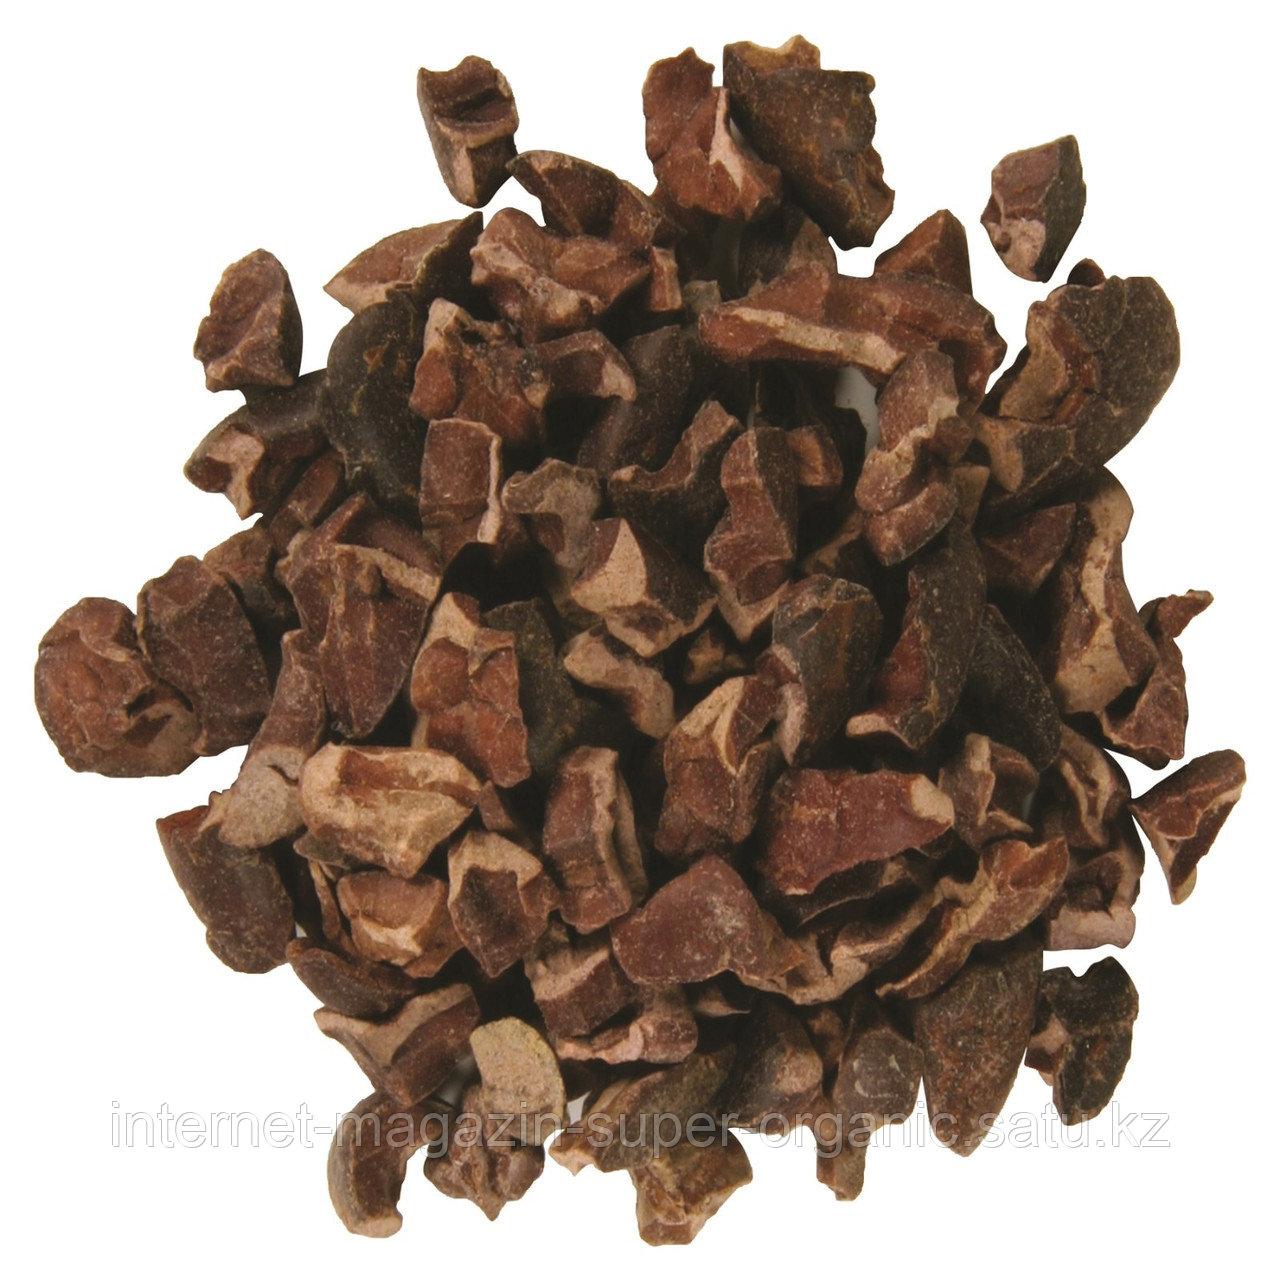 Органические ядра какао-бобов, 16 унций (453 г), Frontier Natural Products